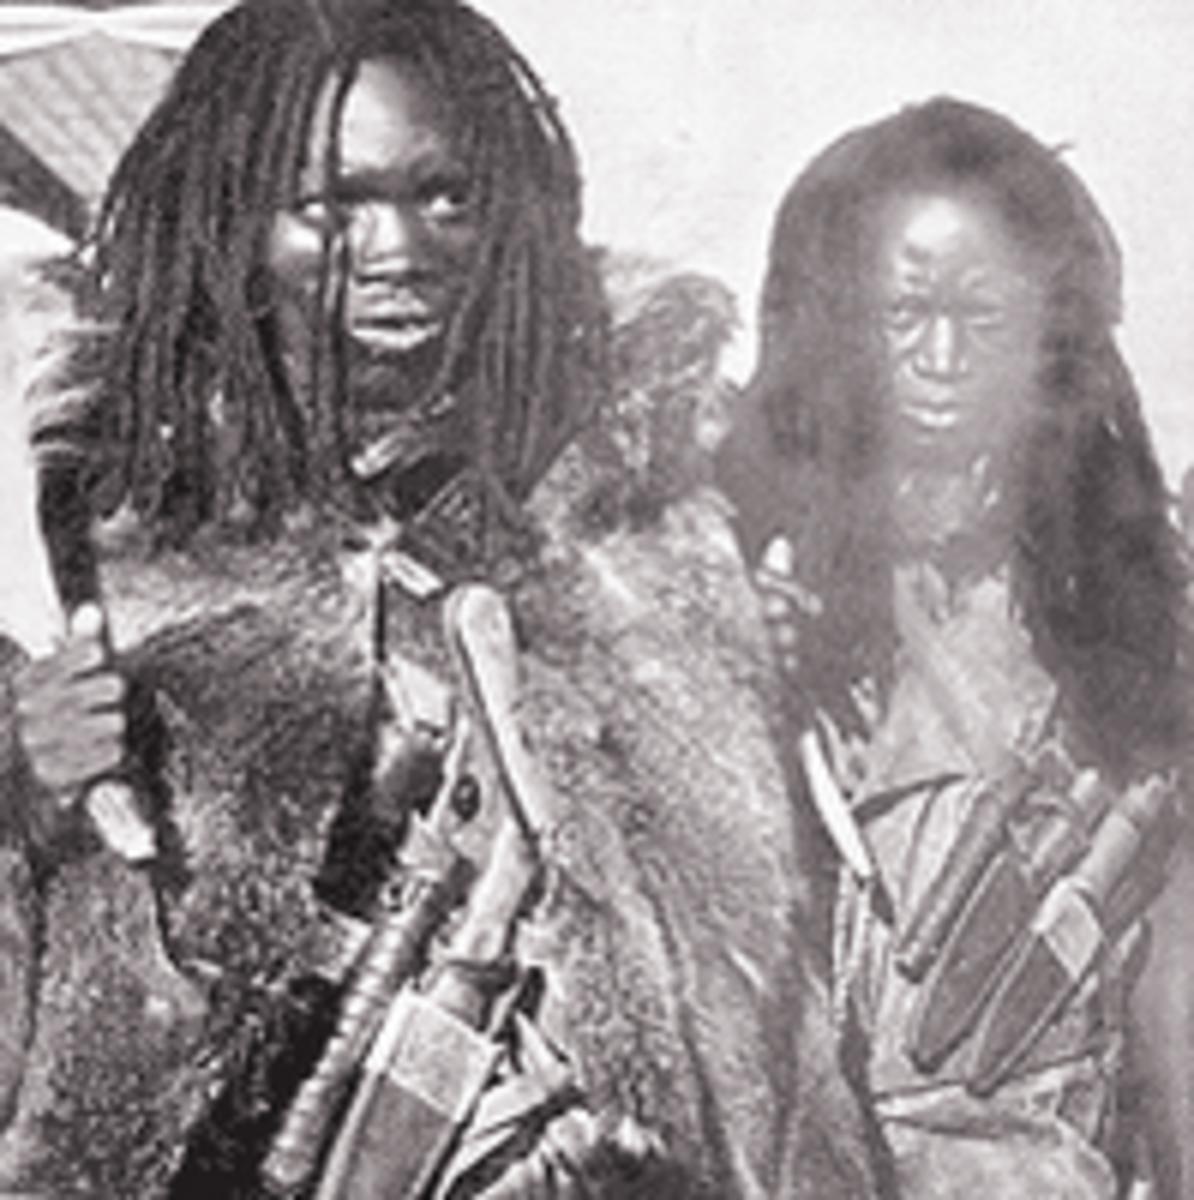 Mau Mau Warriors wearing Dreadlocks as a virtue of rebellion.